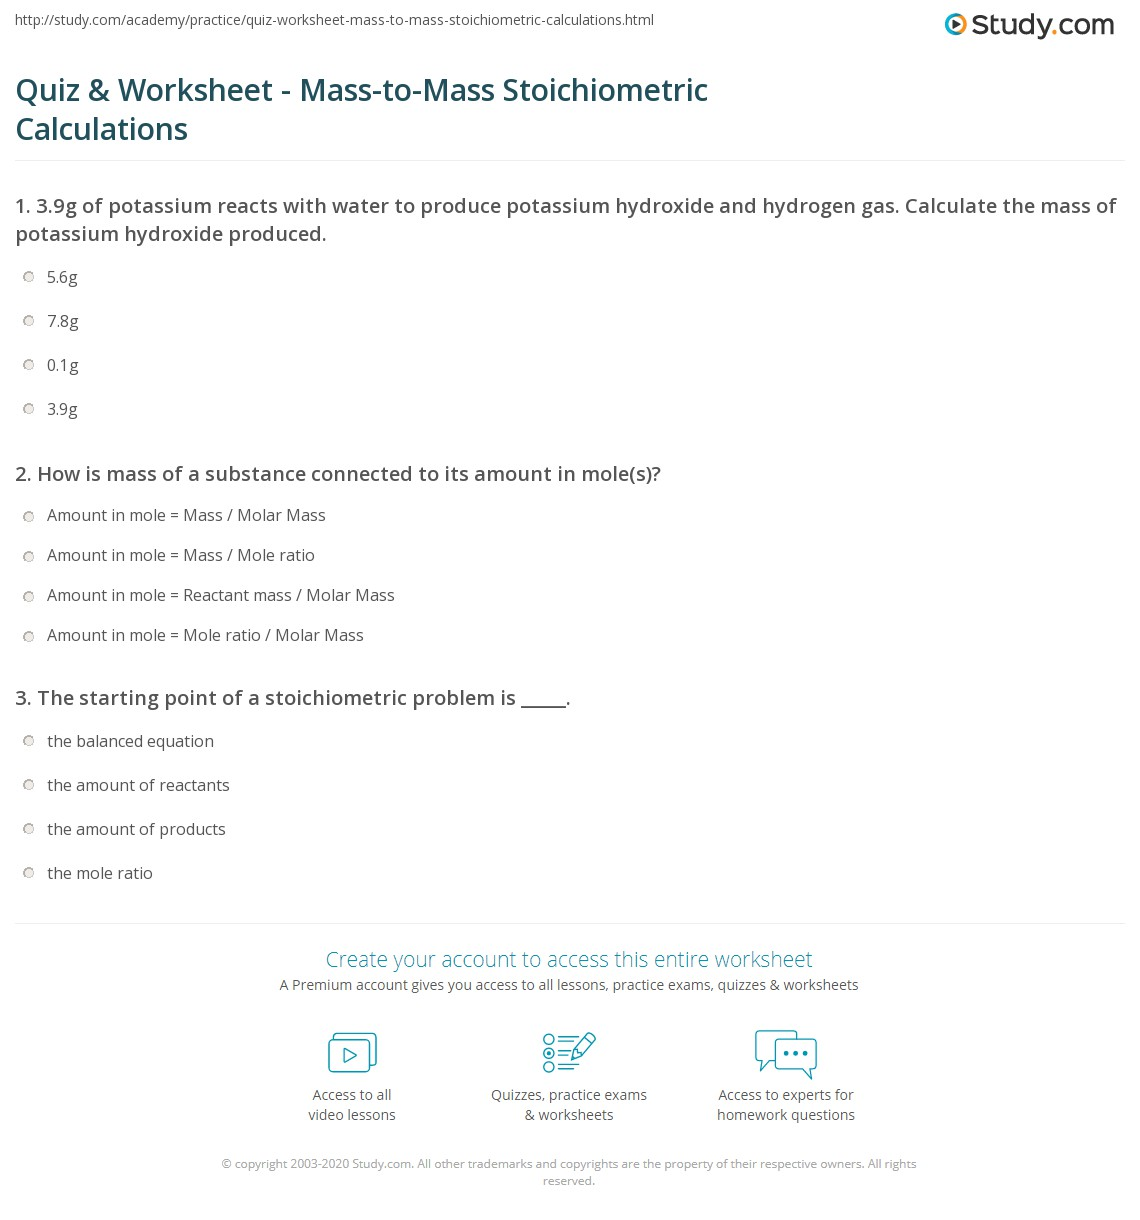 Quiz W Ksheet M Ss To M Ss Stoichiometric C Lcul Ti S